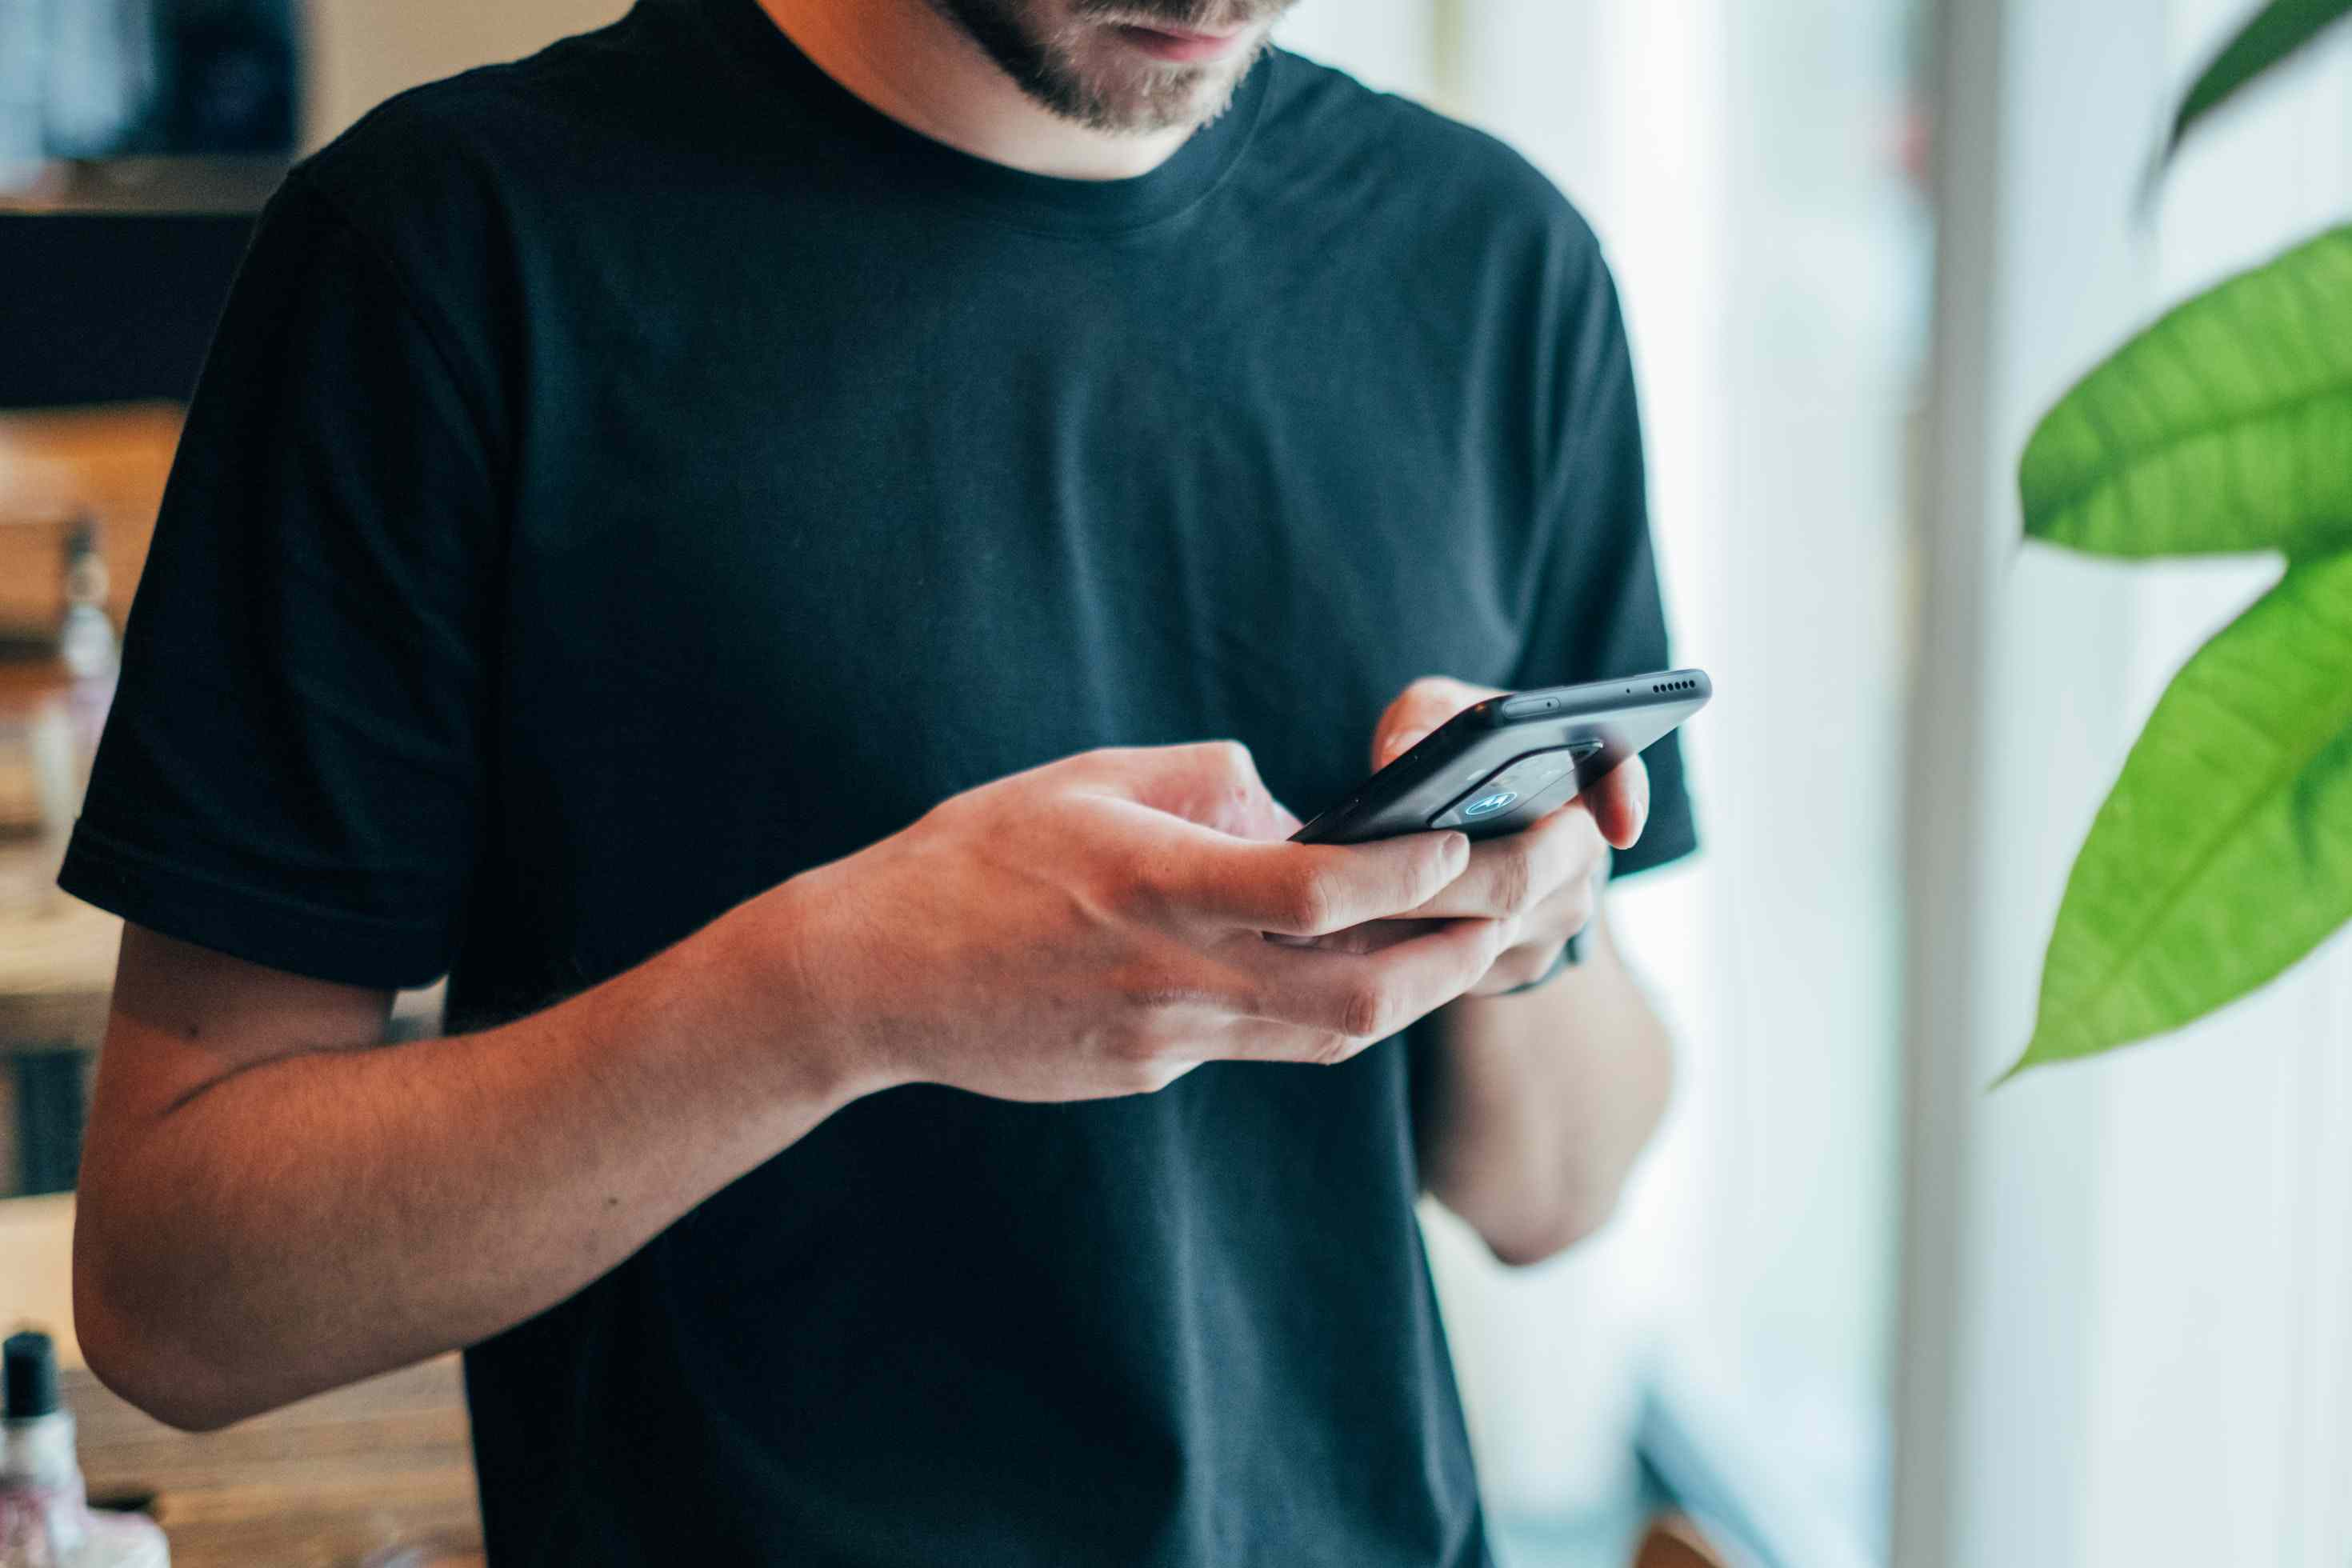 man in black shirt using smartphone